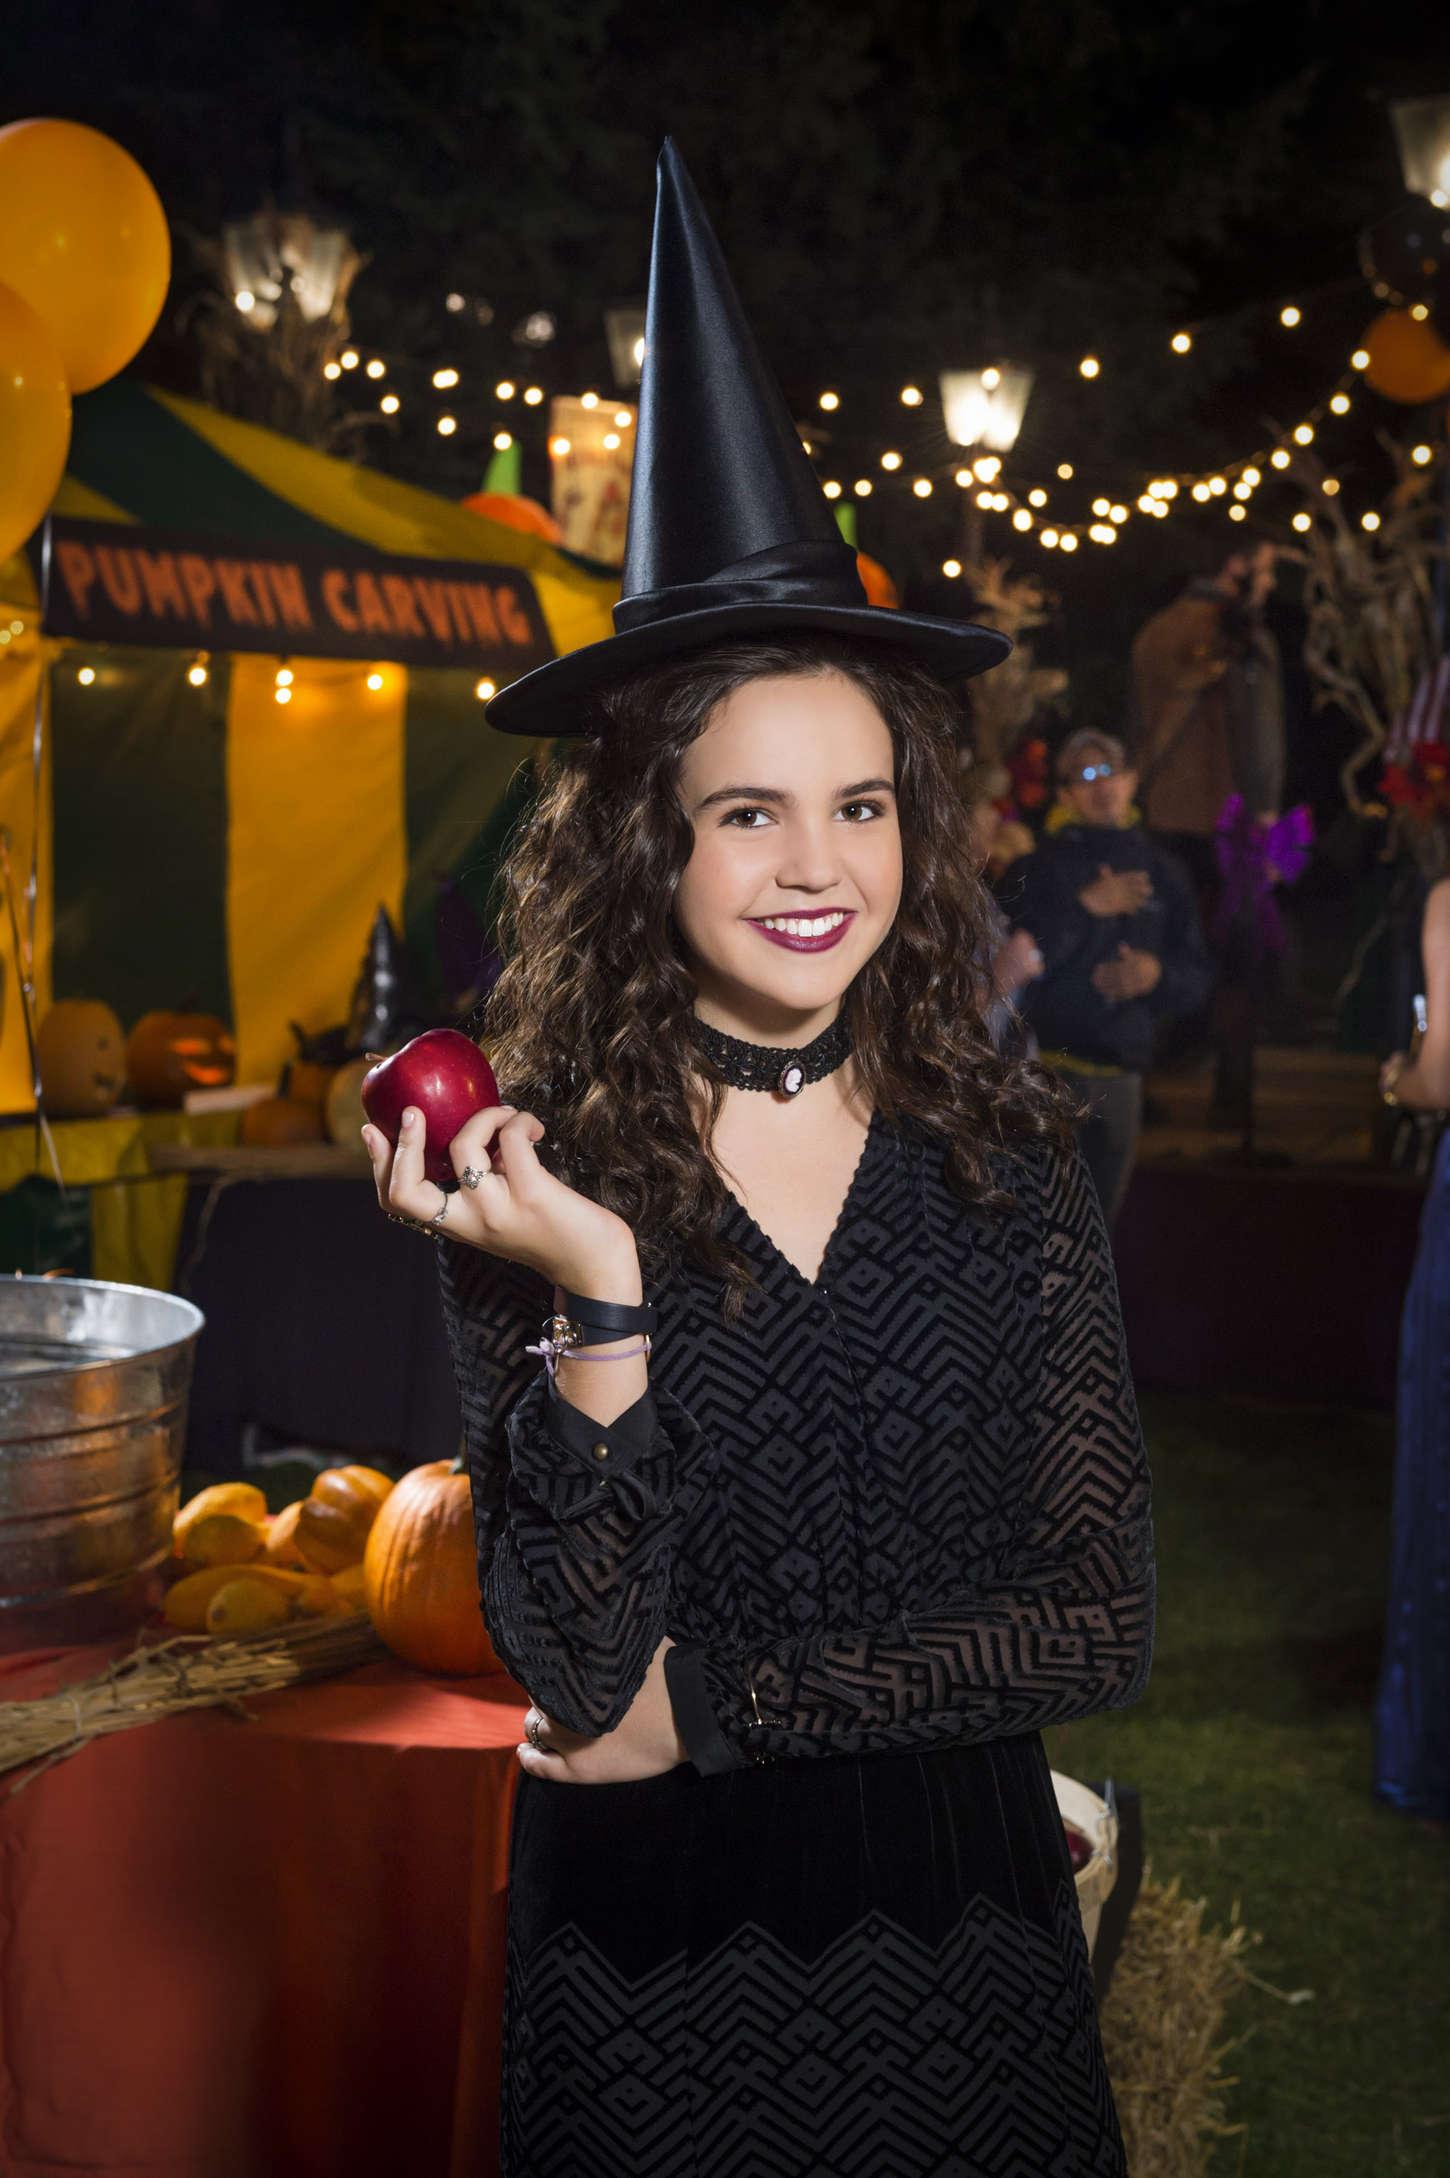 Bailee Madison 2015 : ailee Madison: Good Witch Season 2 Halloween Special Promos Stills -06